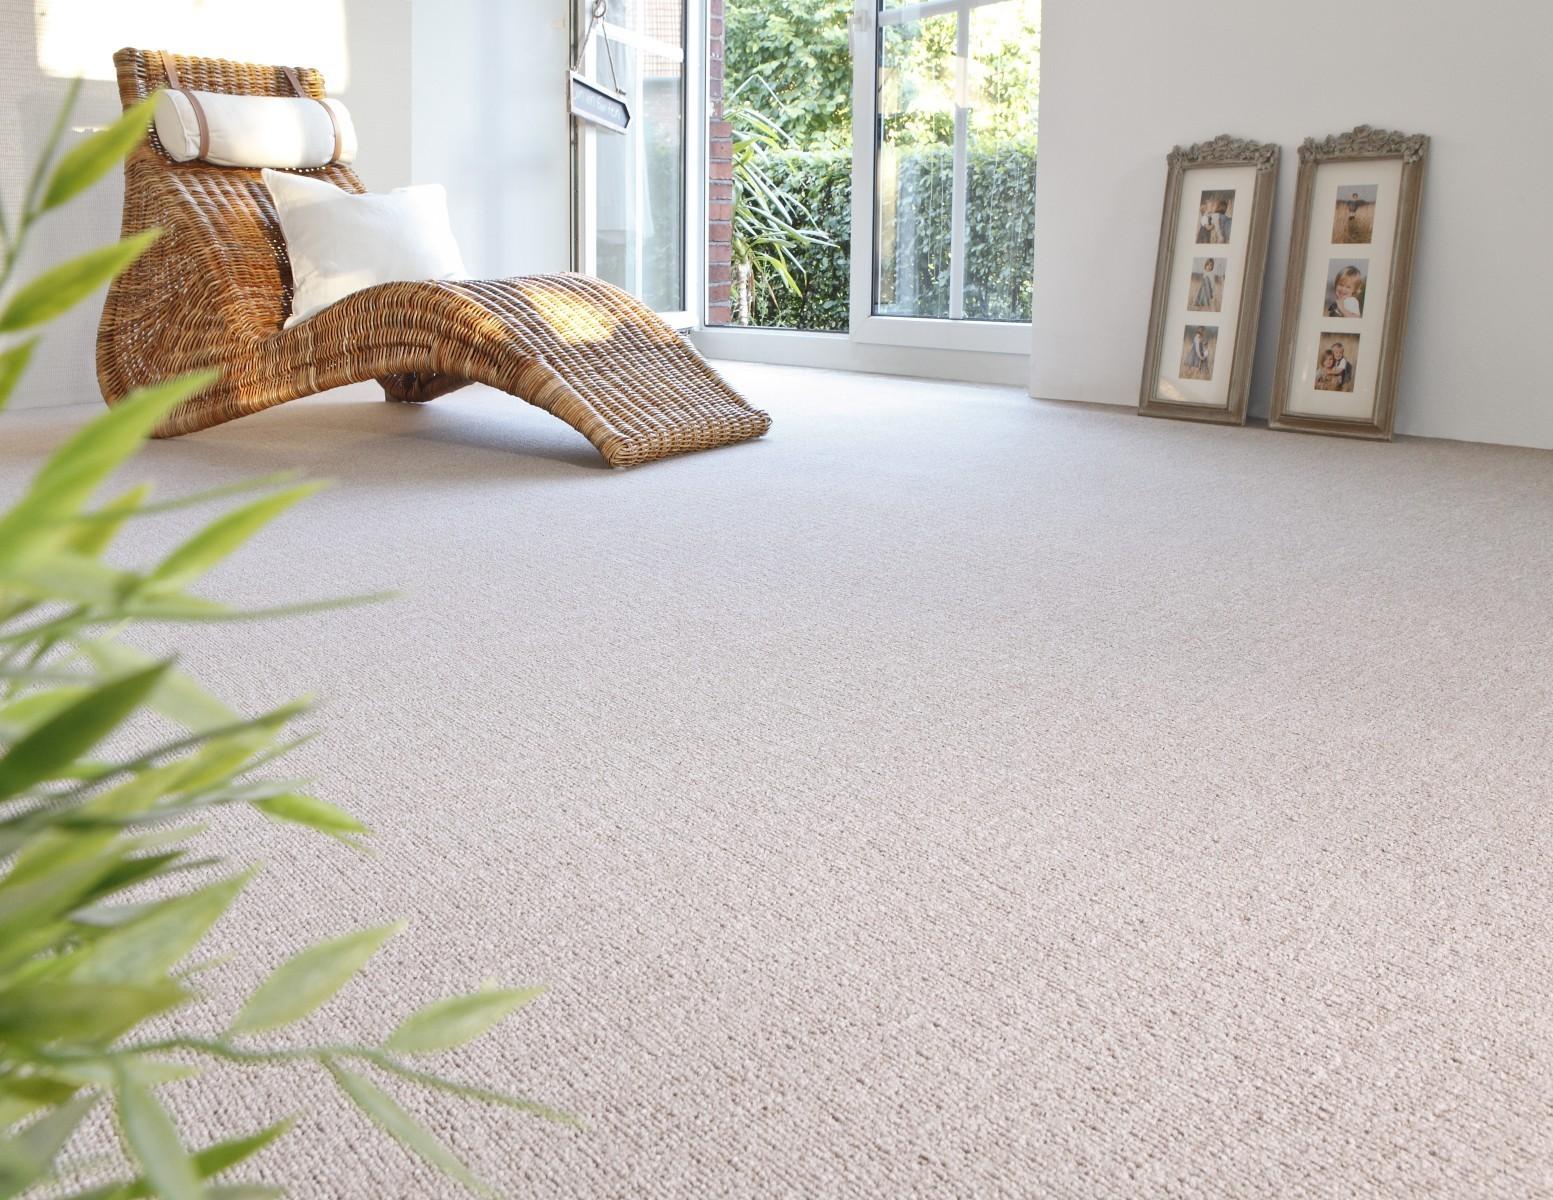 teppichboden reinkemeier rietberg handel logistik. Black Bedroom Furniture Sets. Home Design Ideas